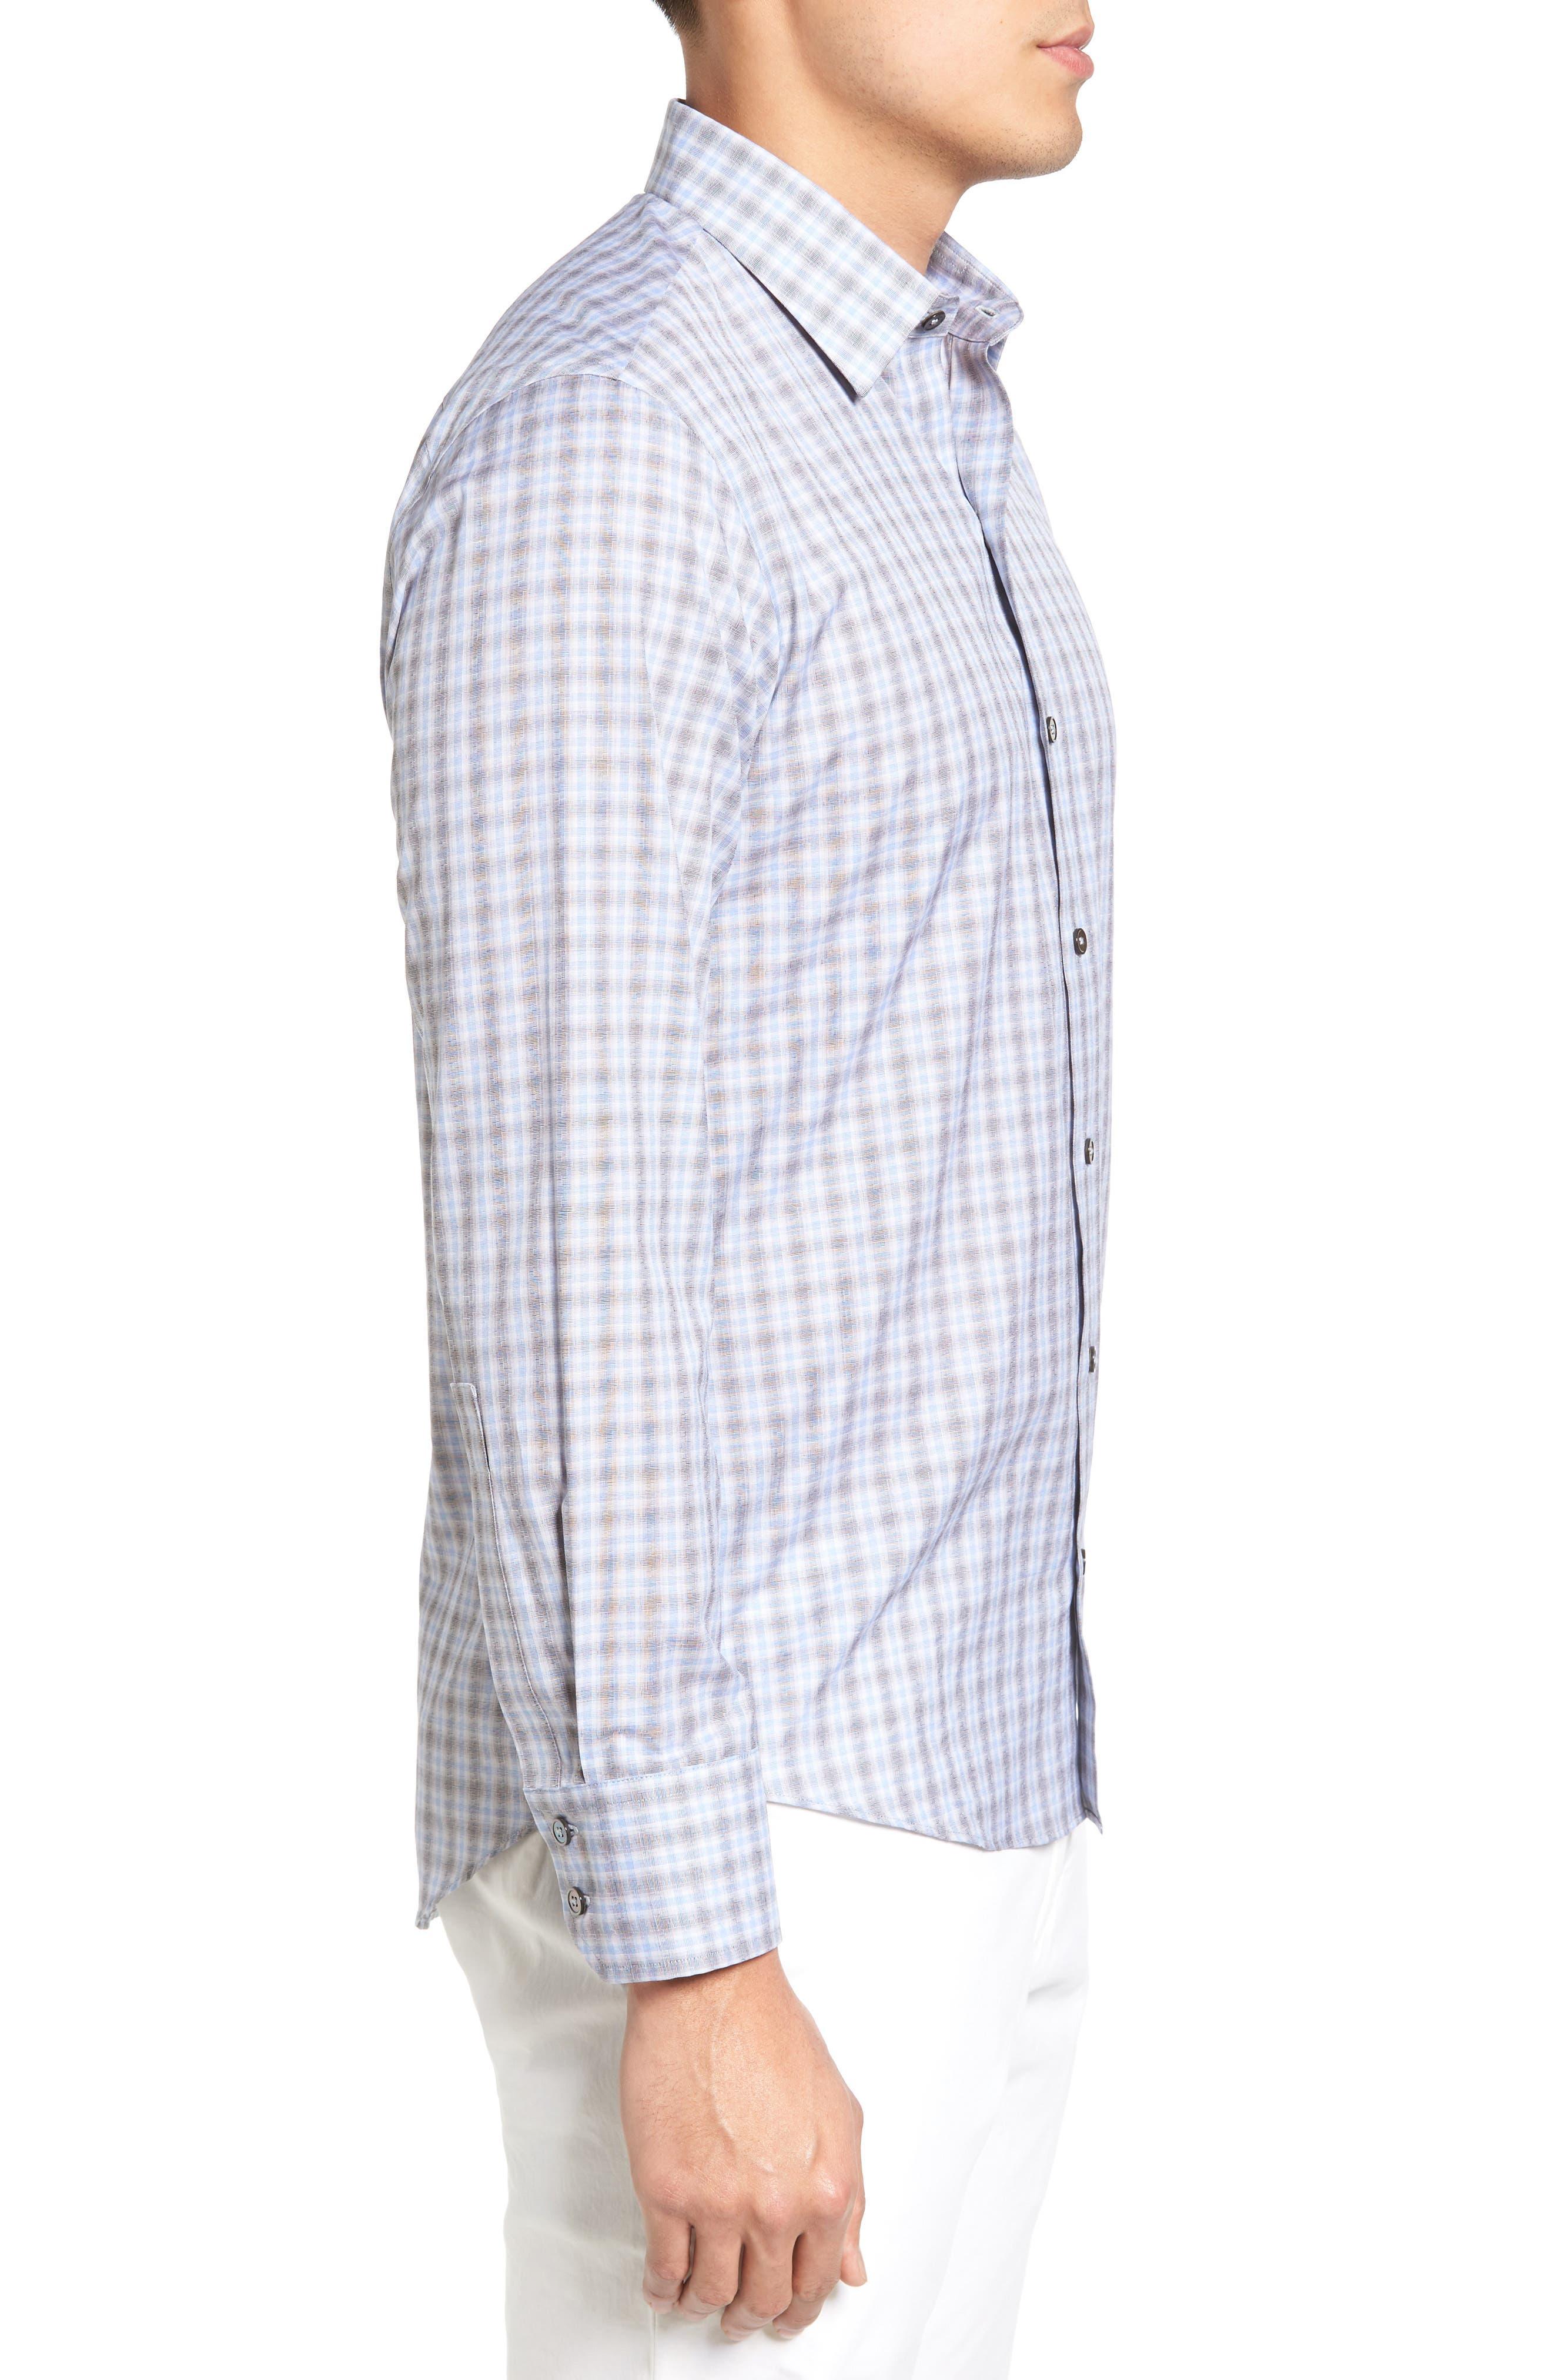 Cristiano Trim Fit Plaid Sport Shirt,                             Alternate thumbnail 3, color,                             020